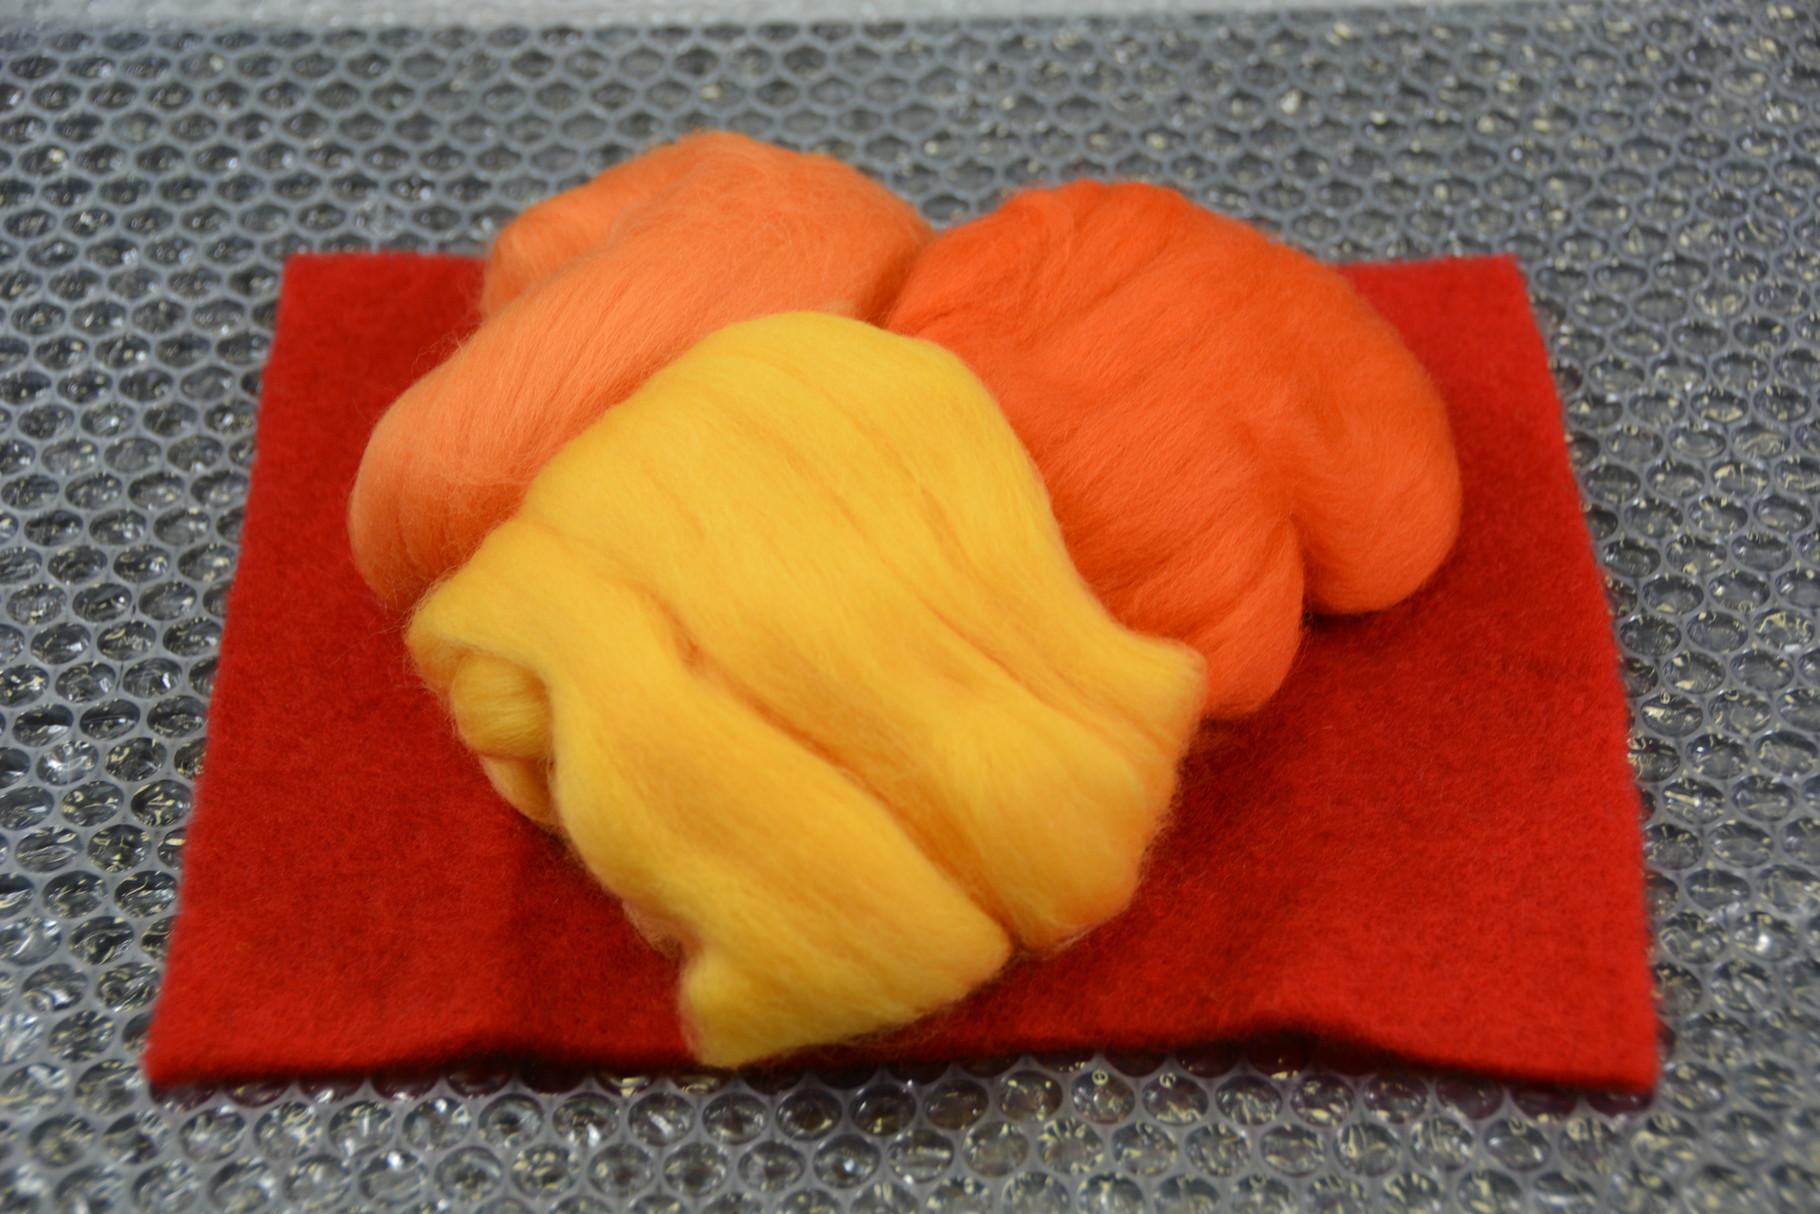 Nadelvlies per Stk. (20 x 25 cm) + Merino Kammzug - erhältlich im Shop